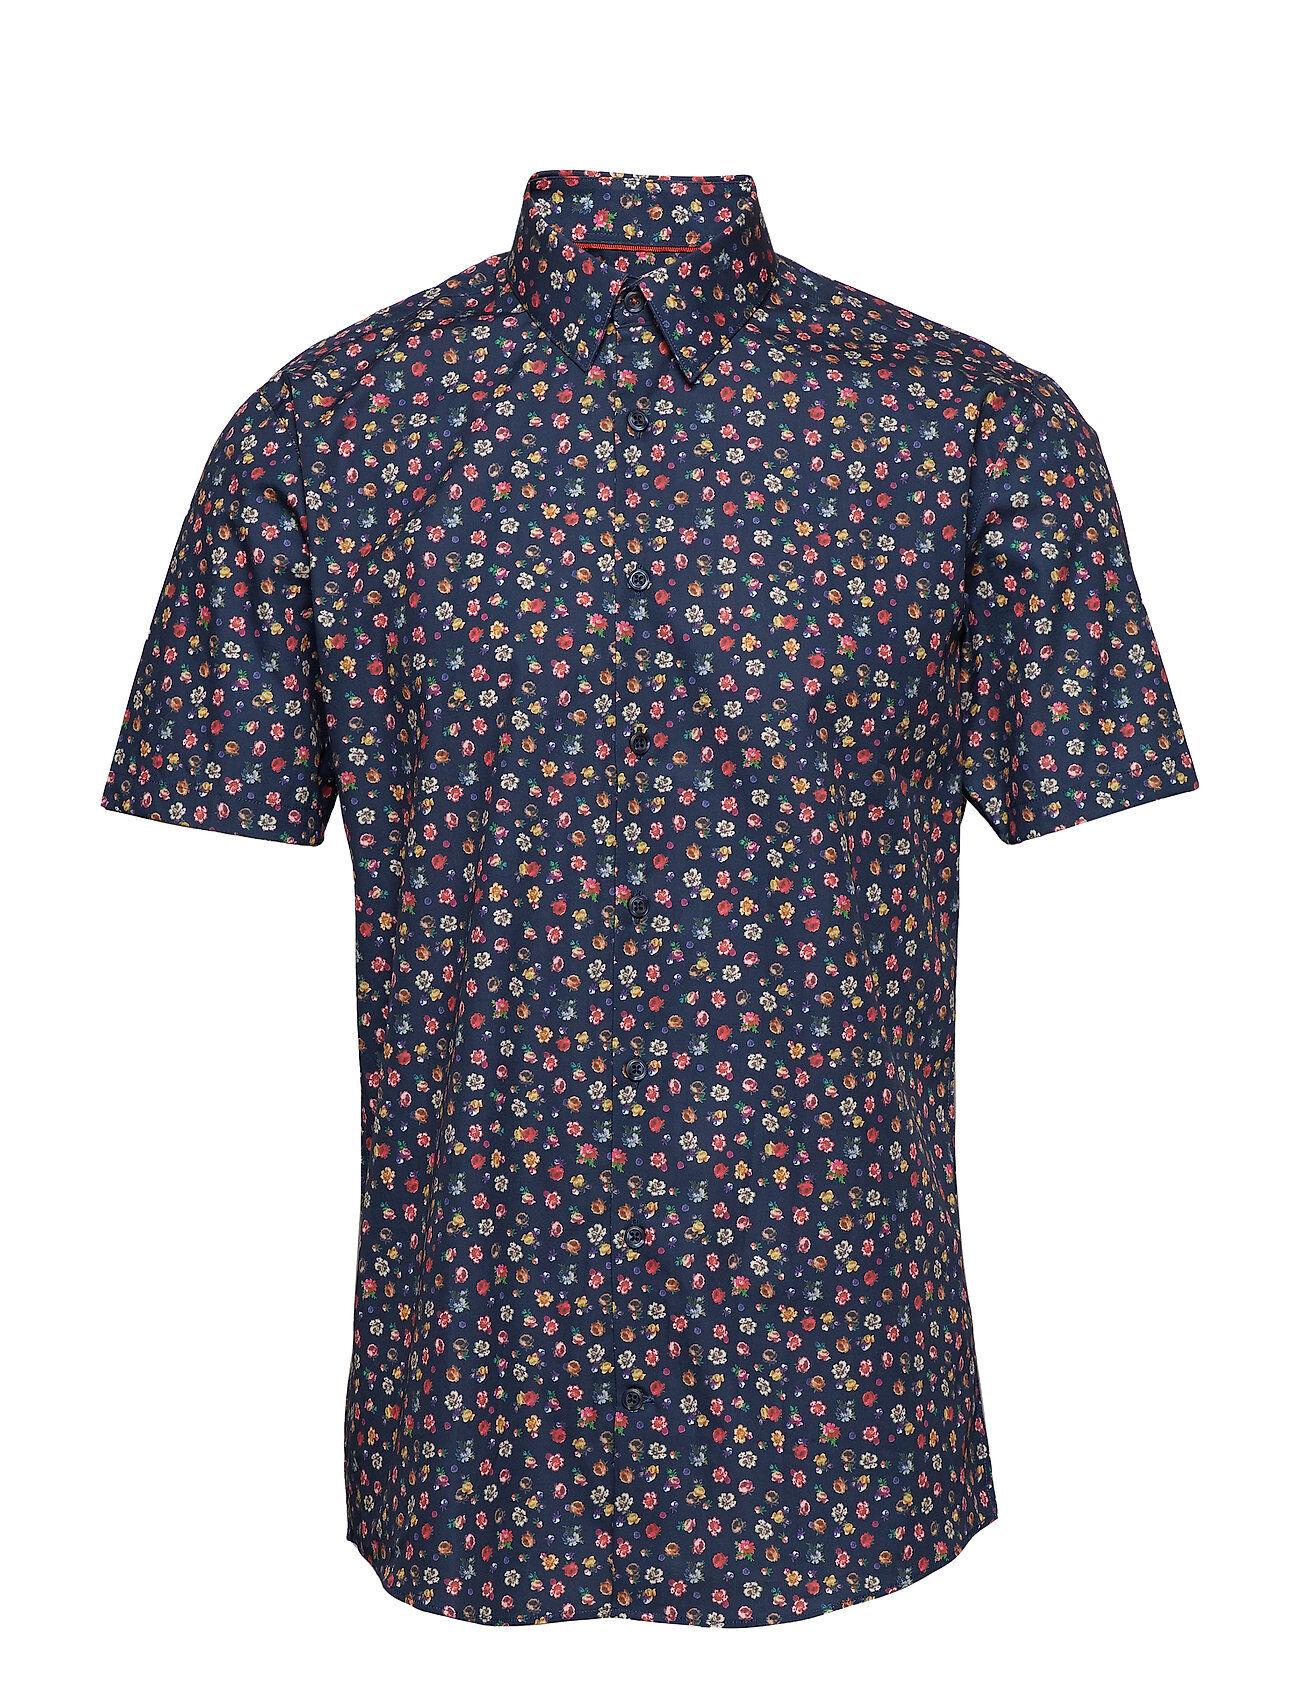 Lindbergh Mini Floral Aop Shirt S/S